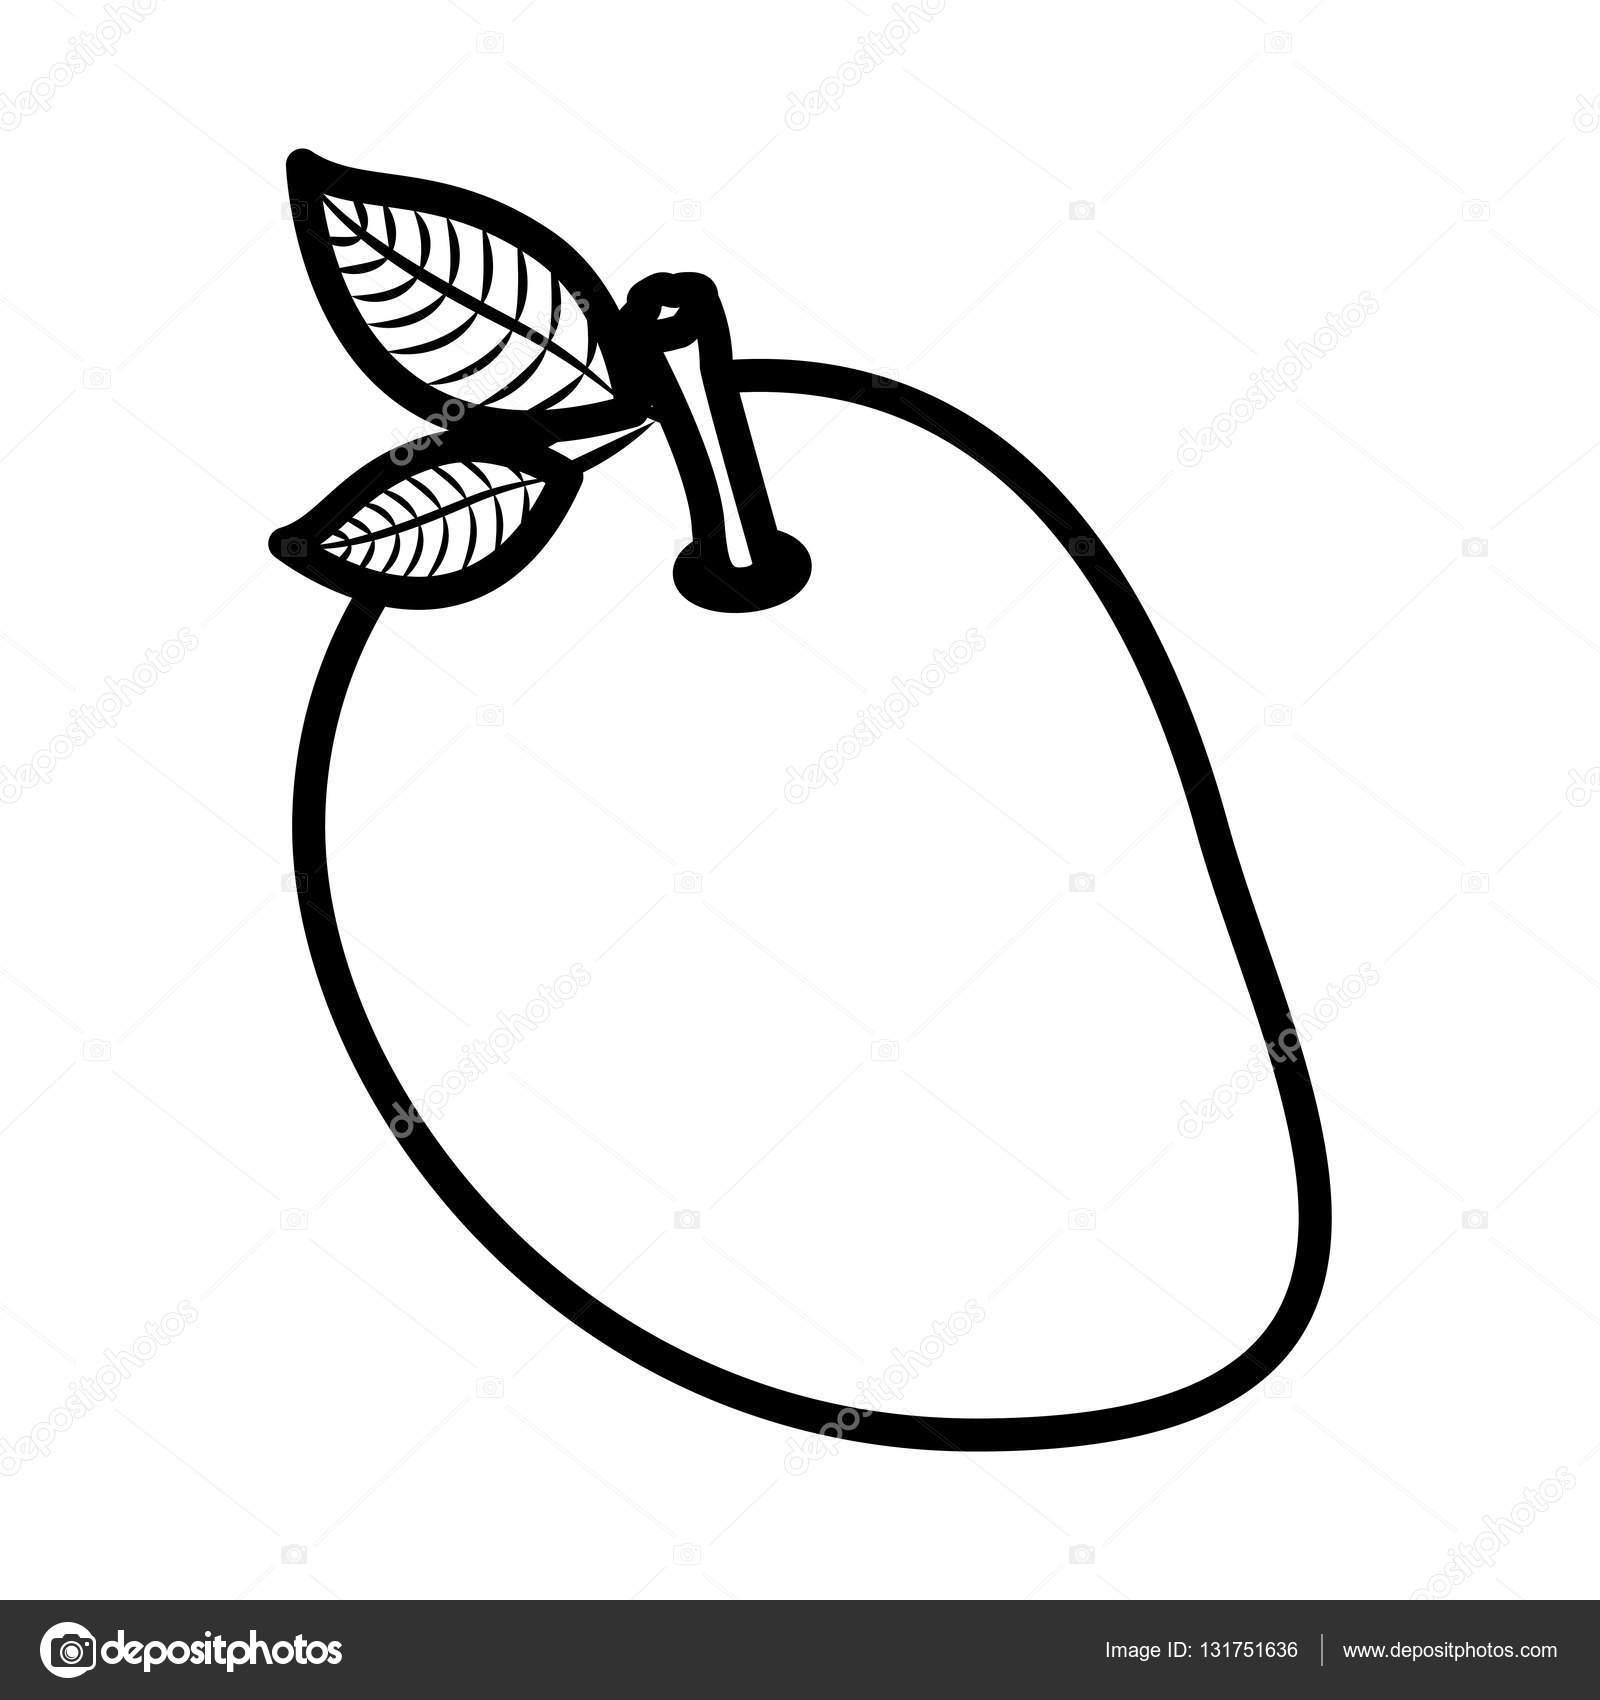 Mango clipart mango fruit Vector Stock #131751636 mango #131751636